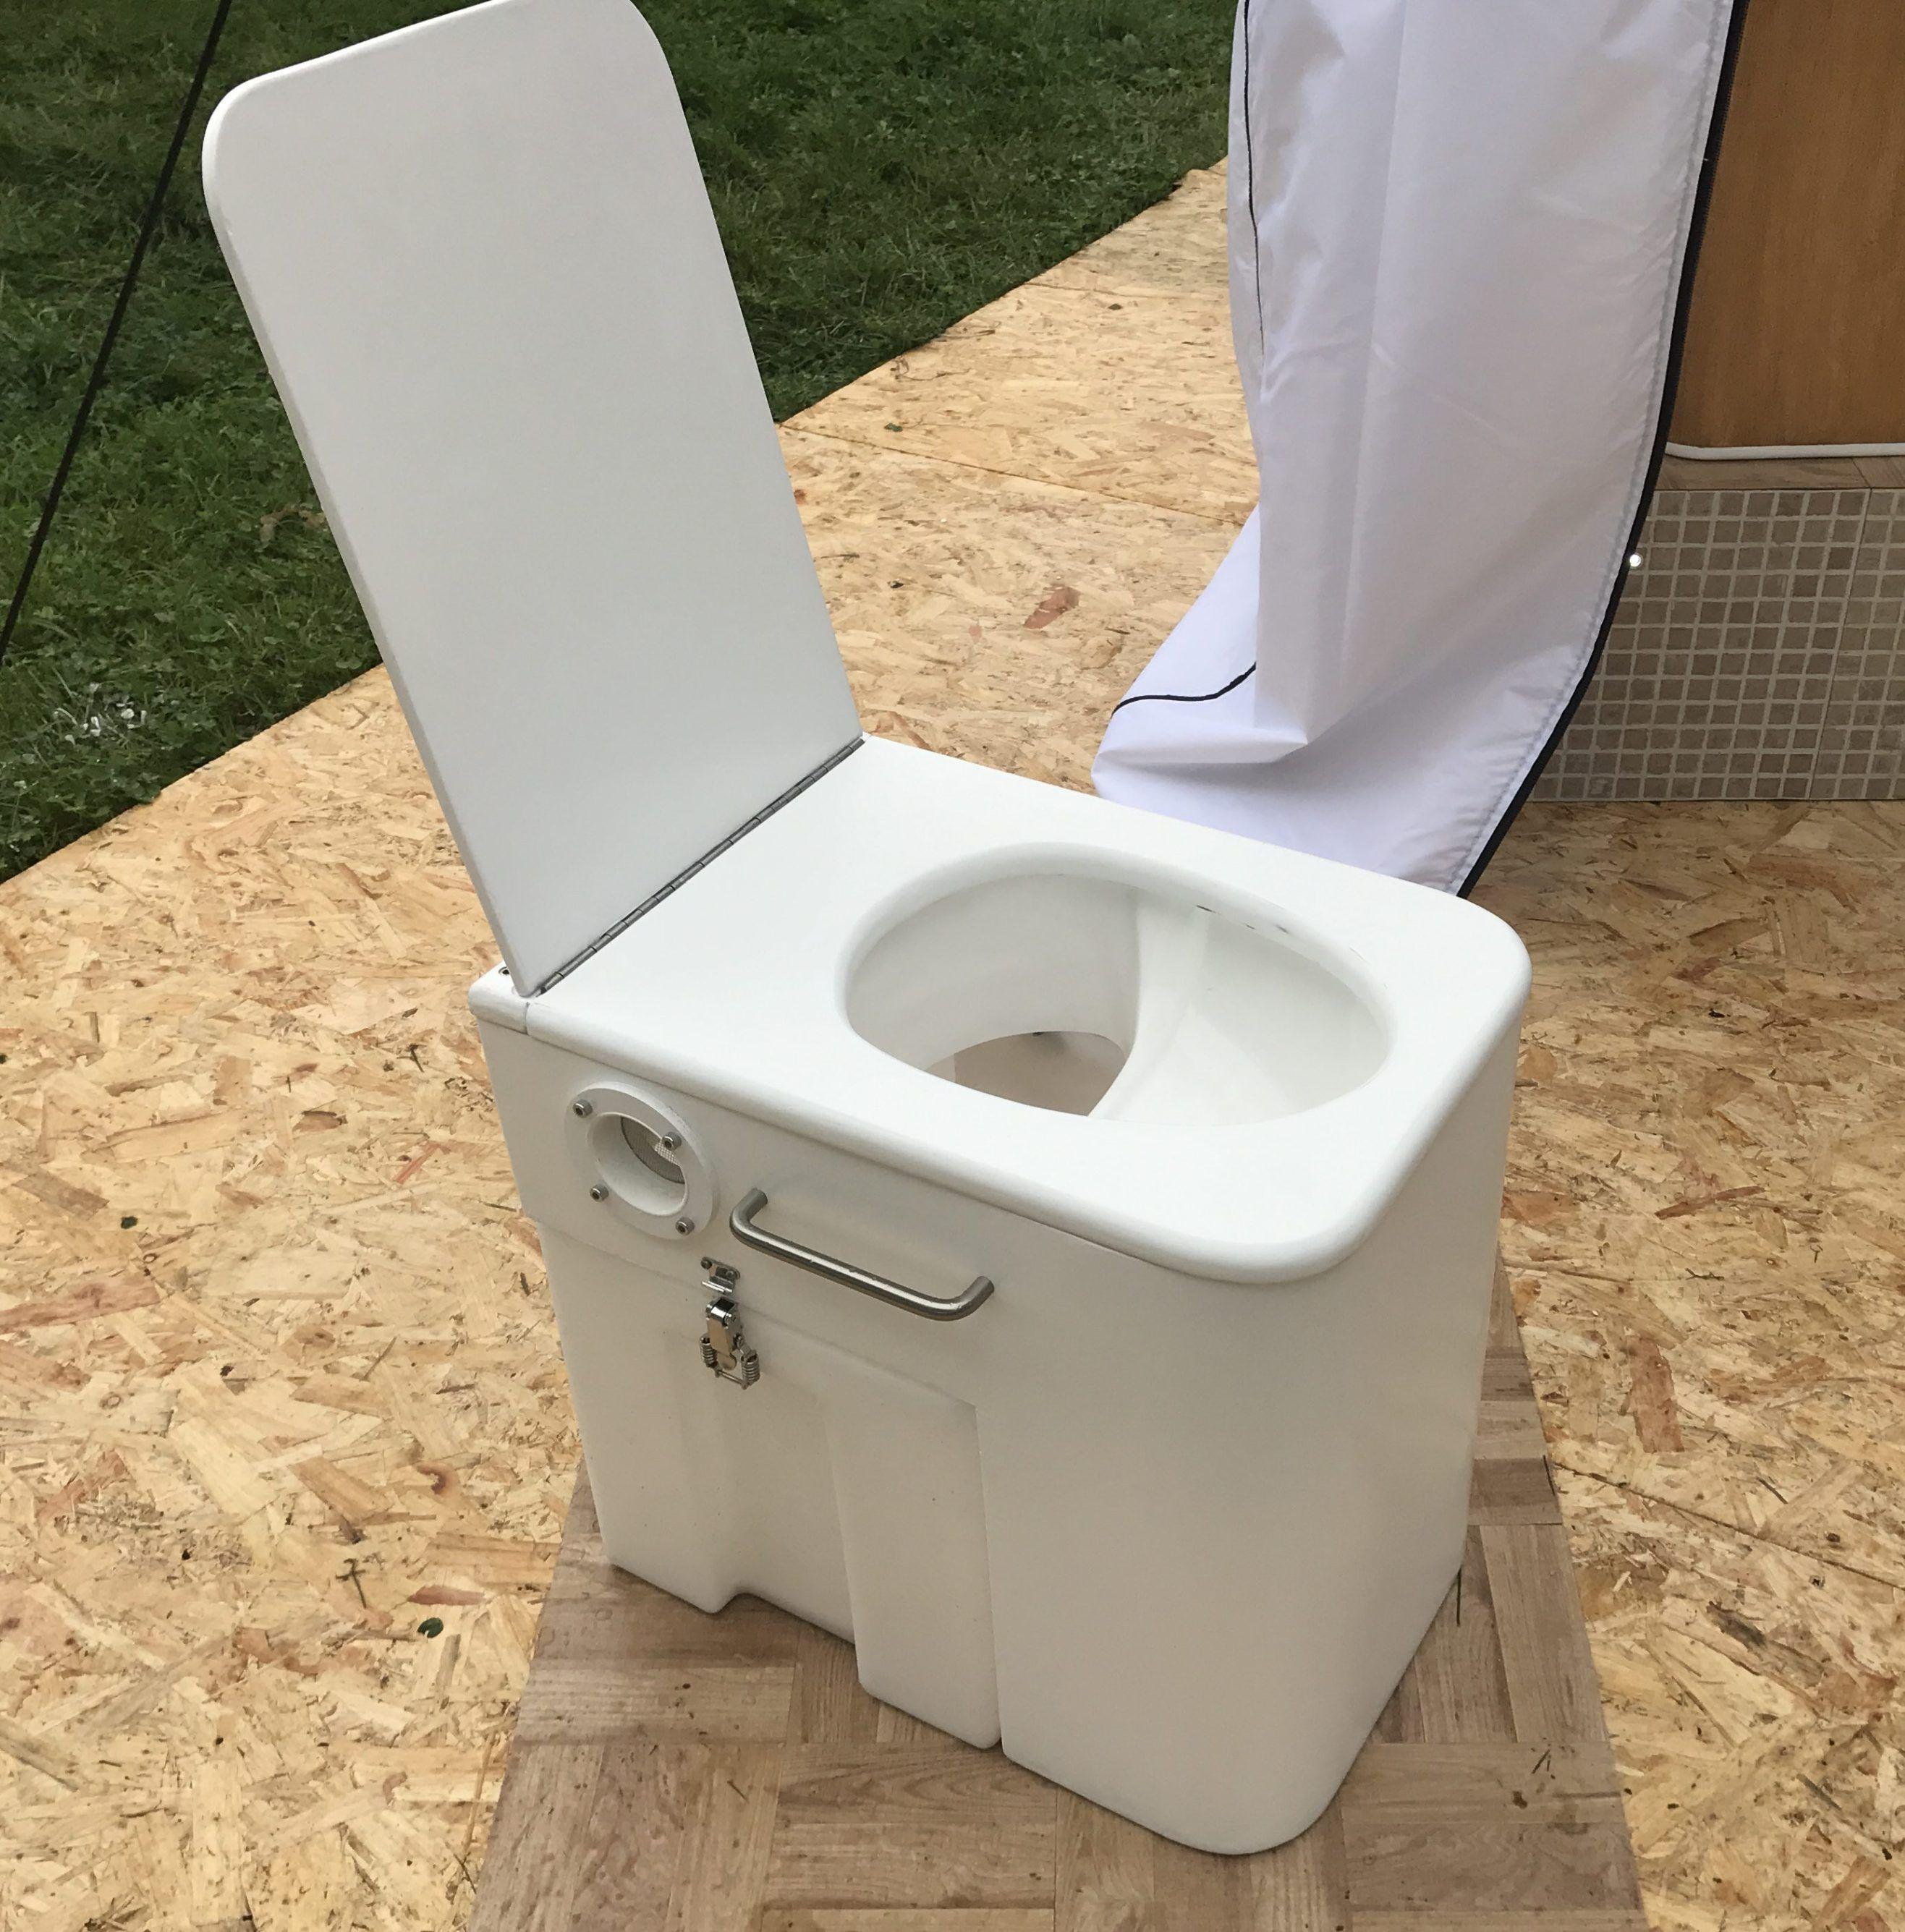 Kildwick Koodle Free Standing Compost Toilet The Little